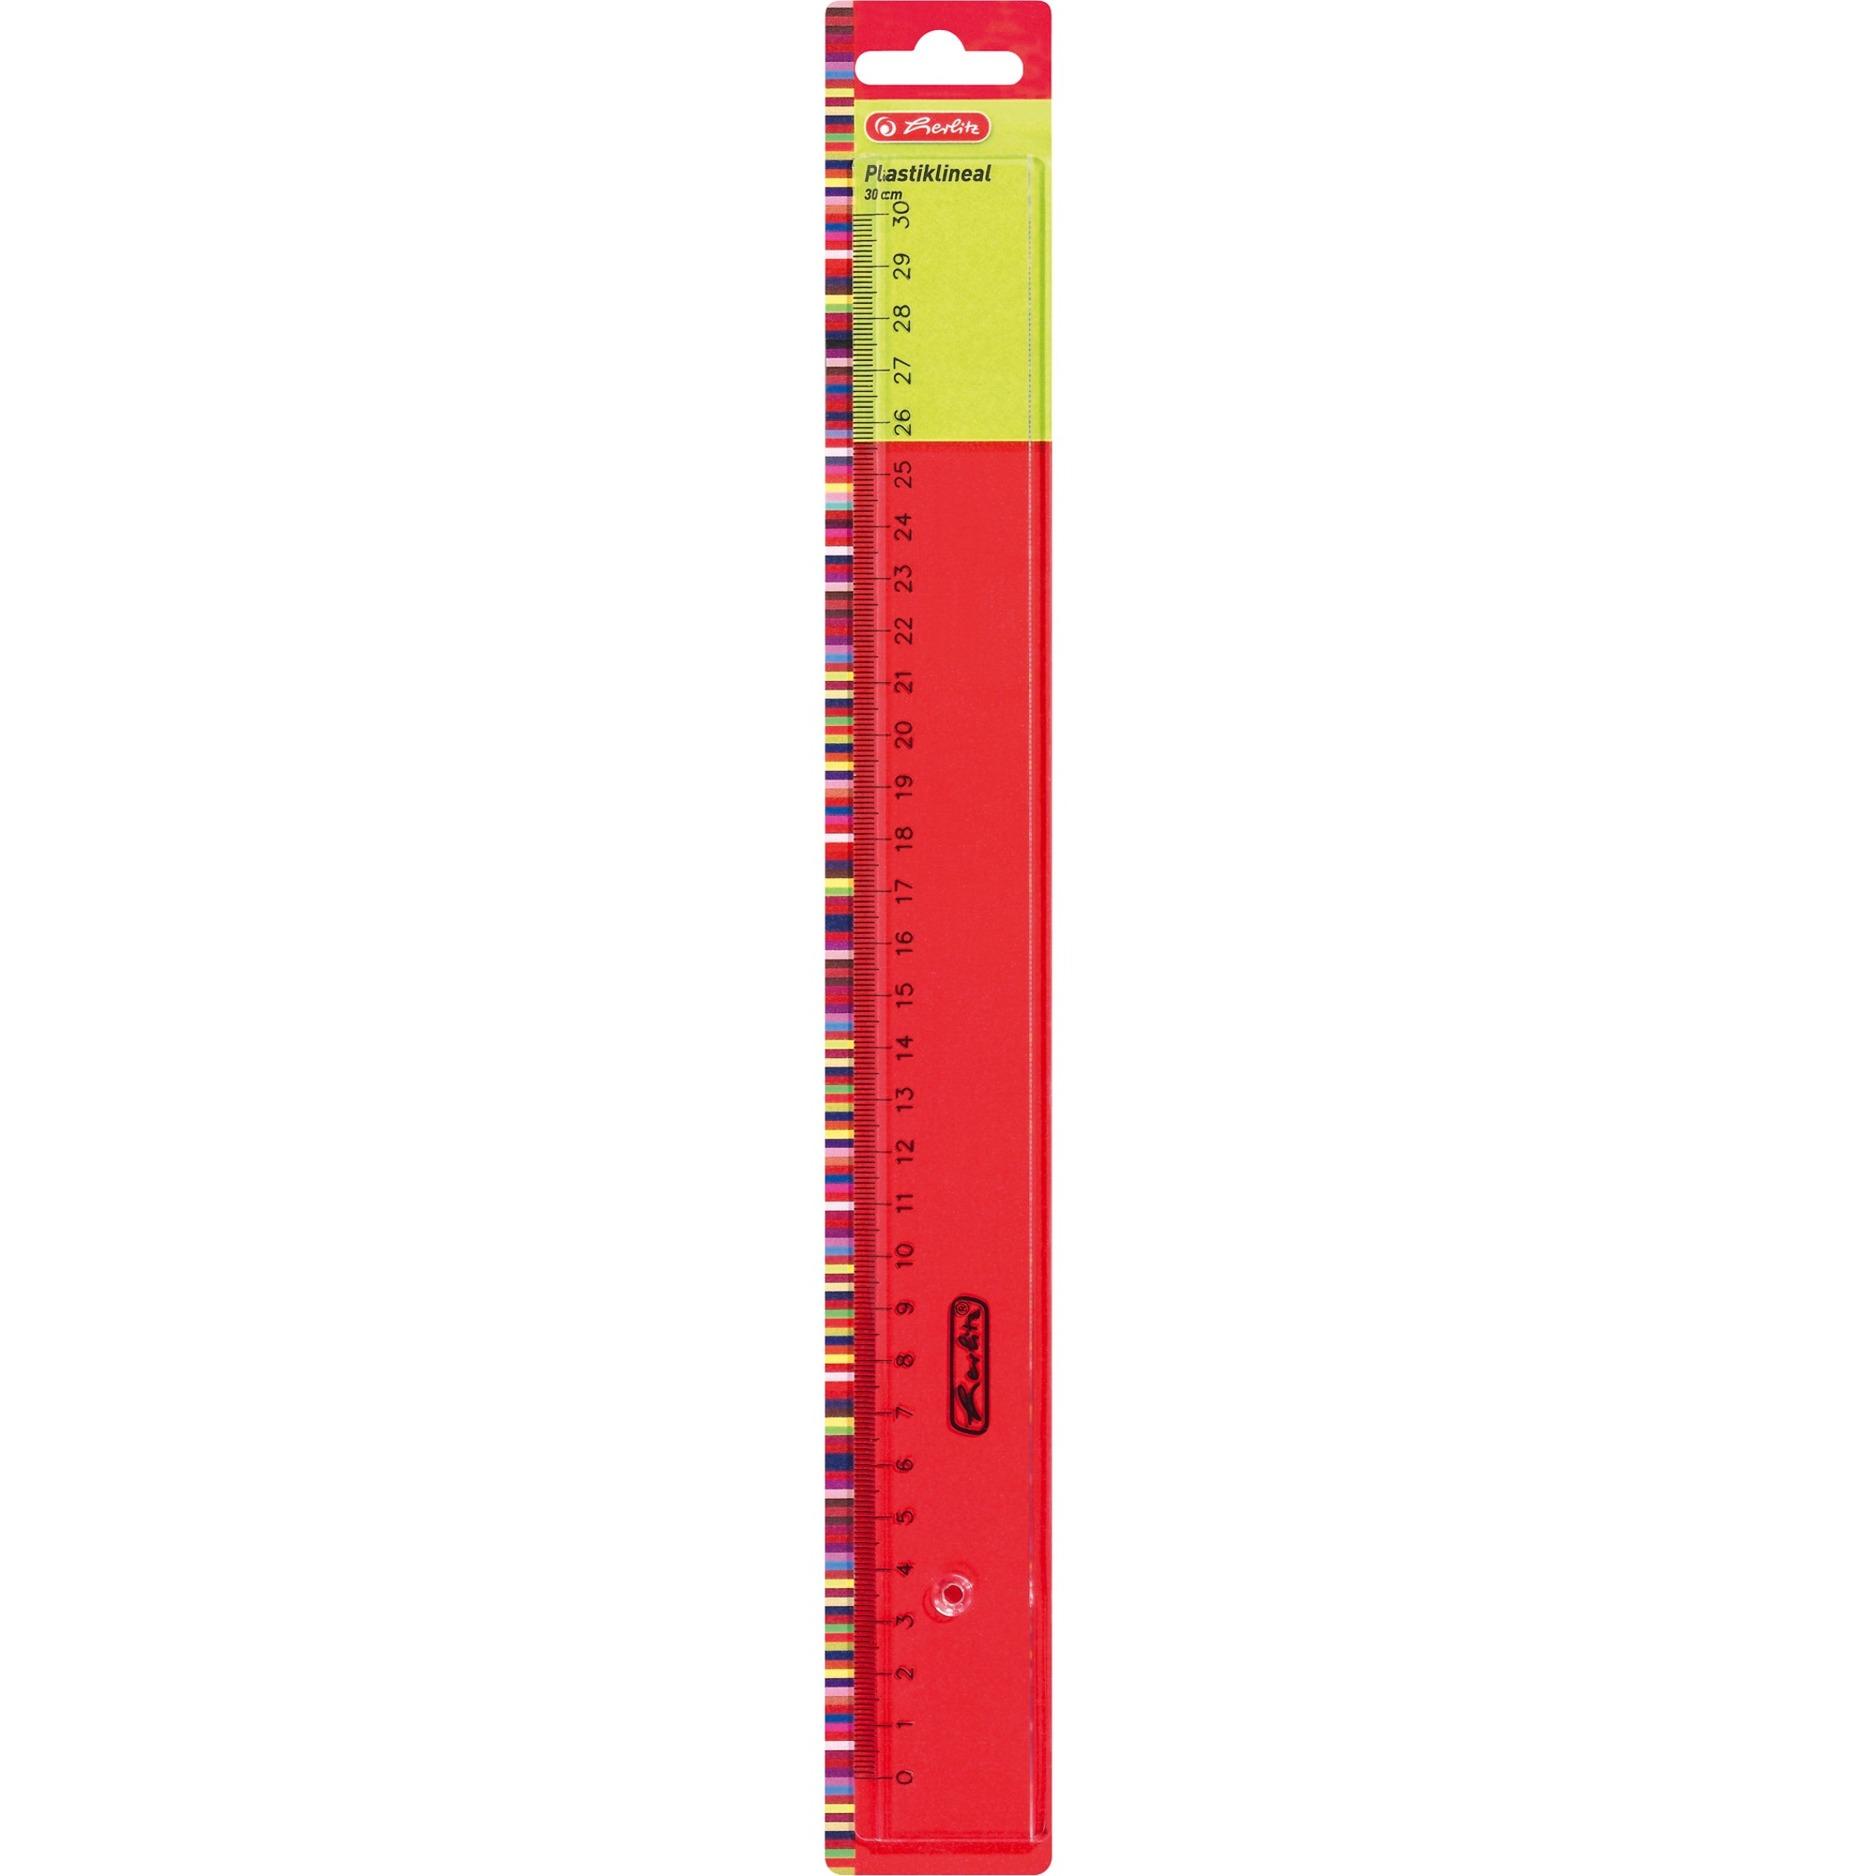 08700106 Line gauge 300mm De plástico Transparente 1pieza(s) cirterio, Regla